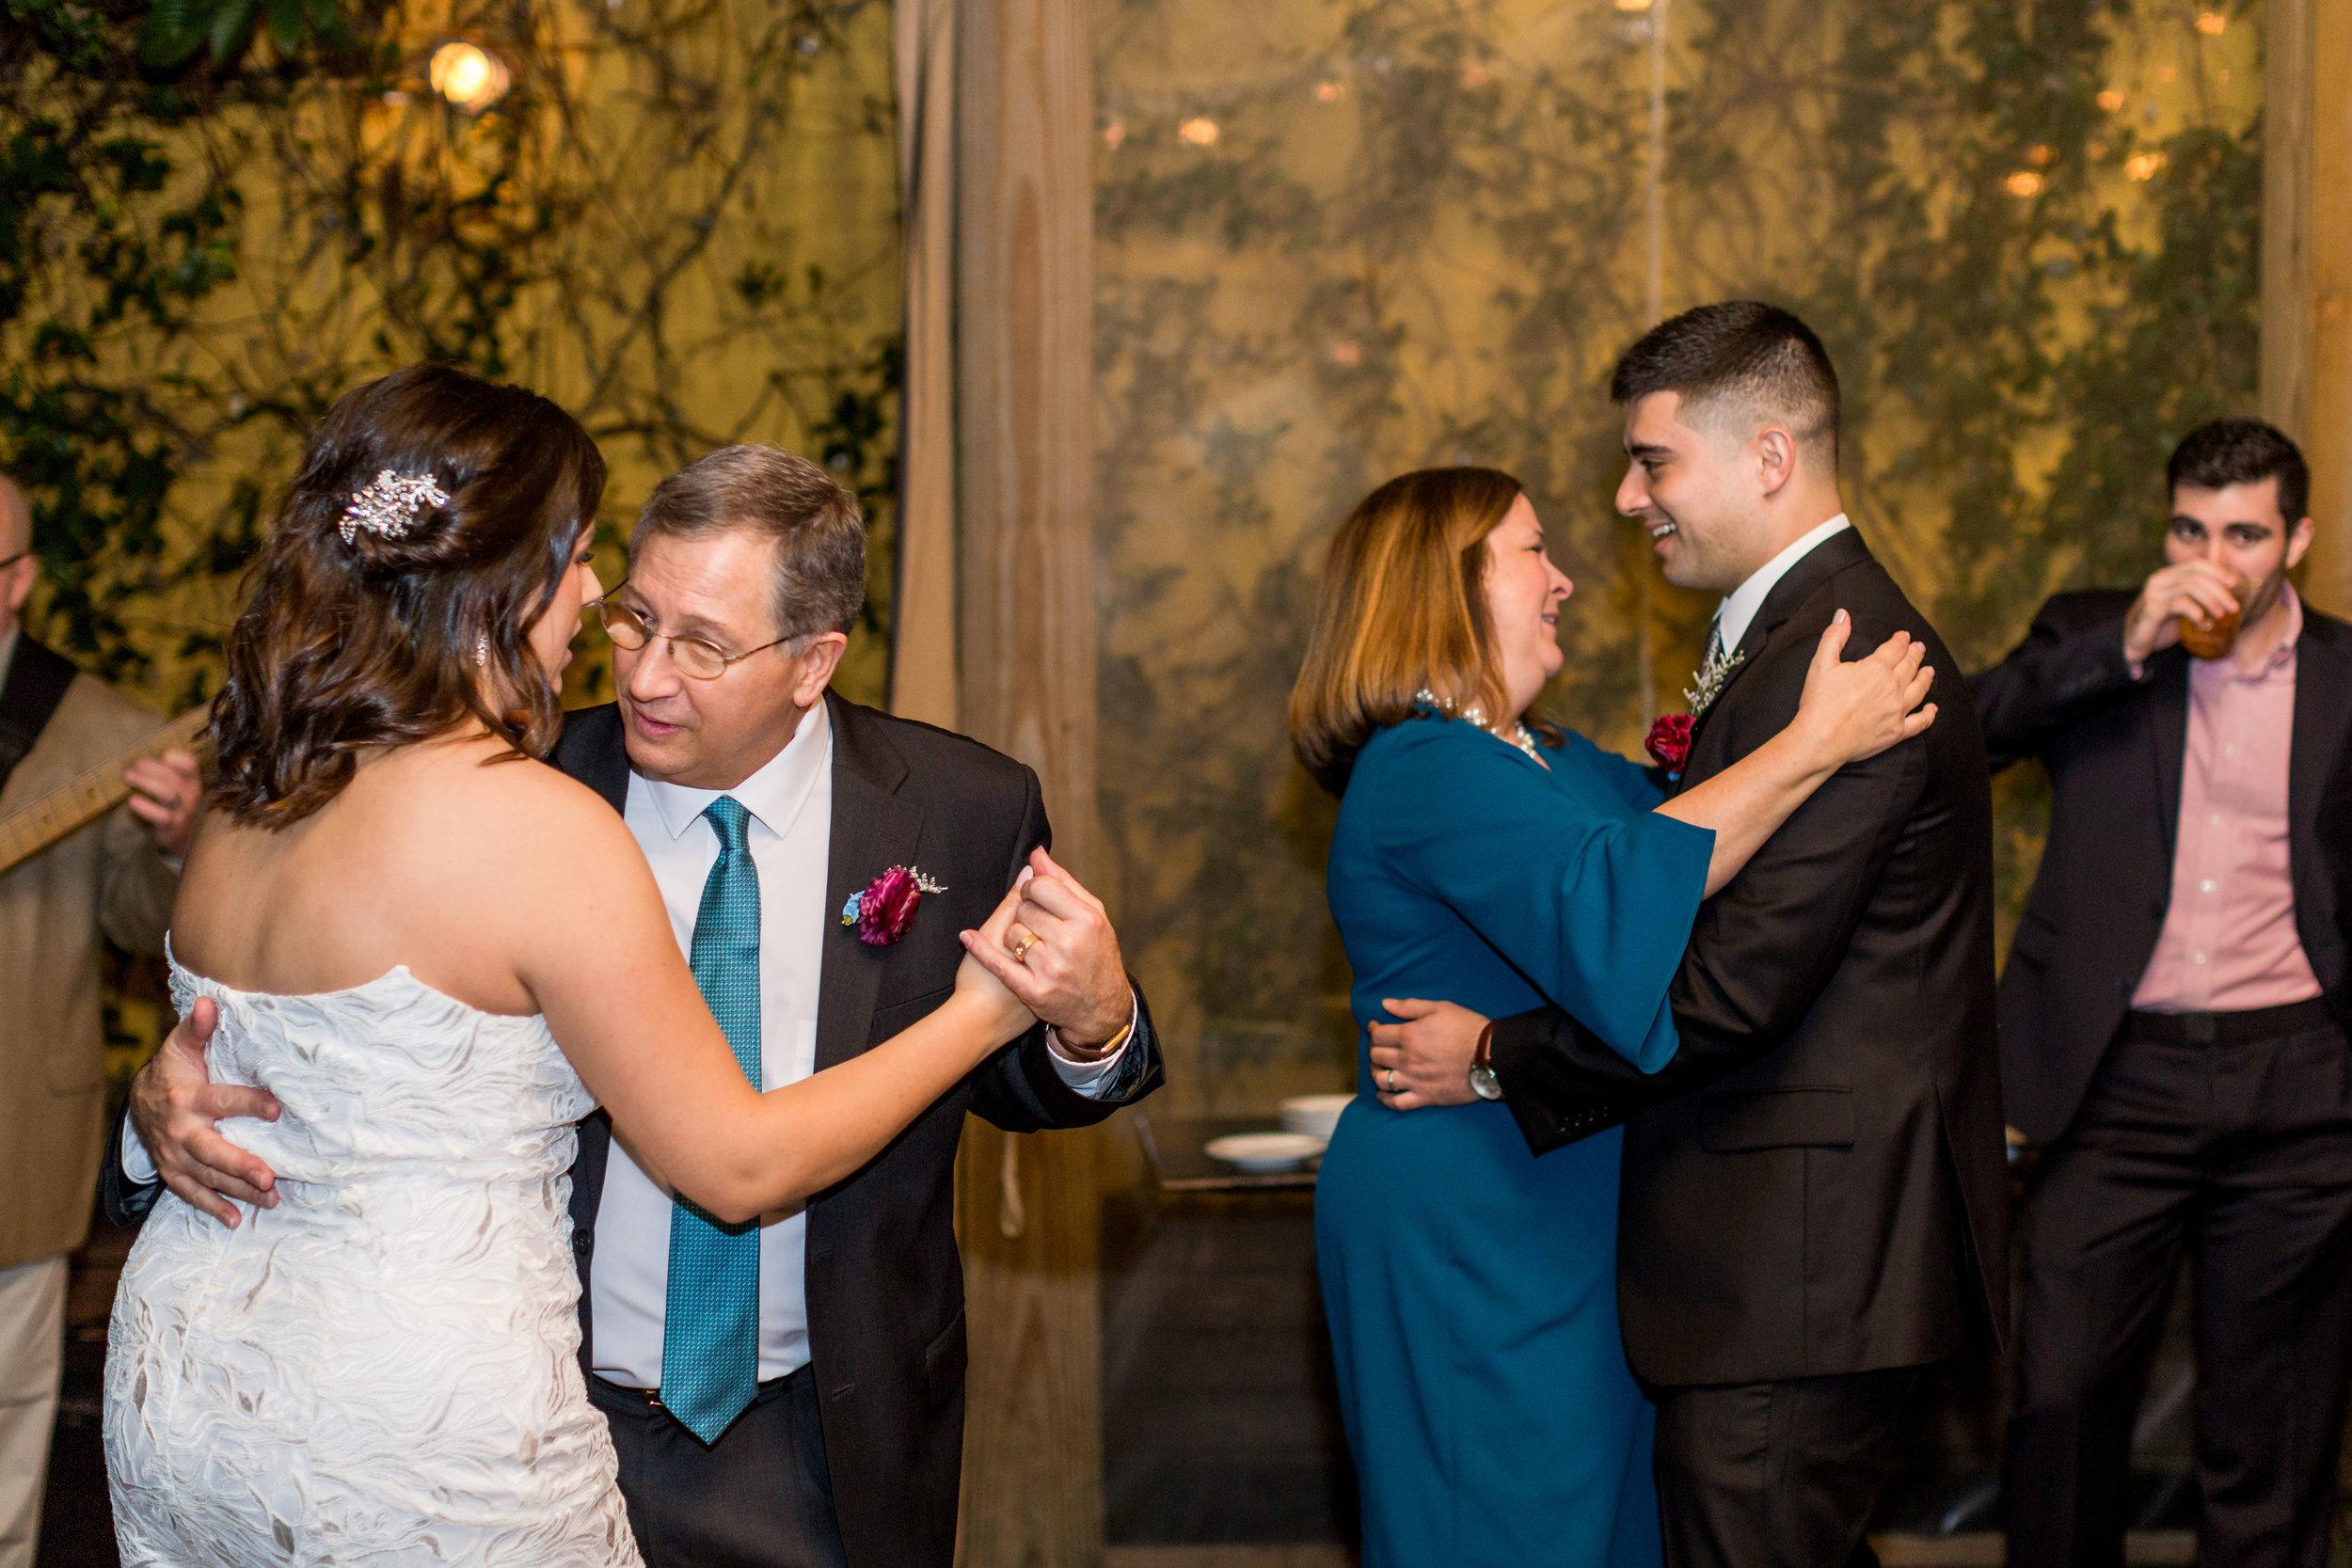 charleston new years elopement popup surprise wedding at upstairs at midtown - scarlet plan & design wedding planners (366).jpg